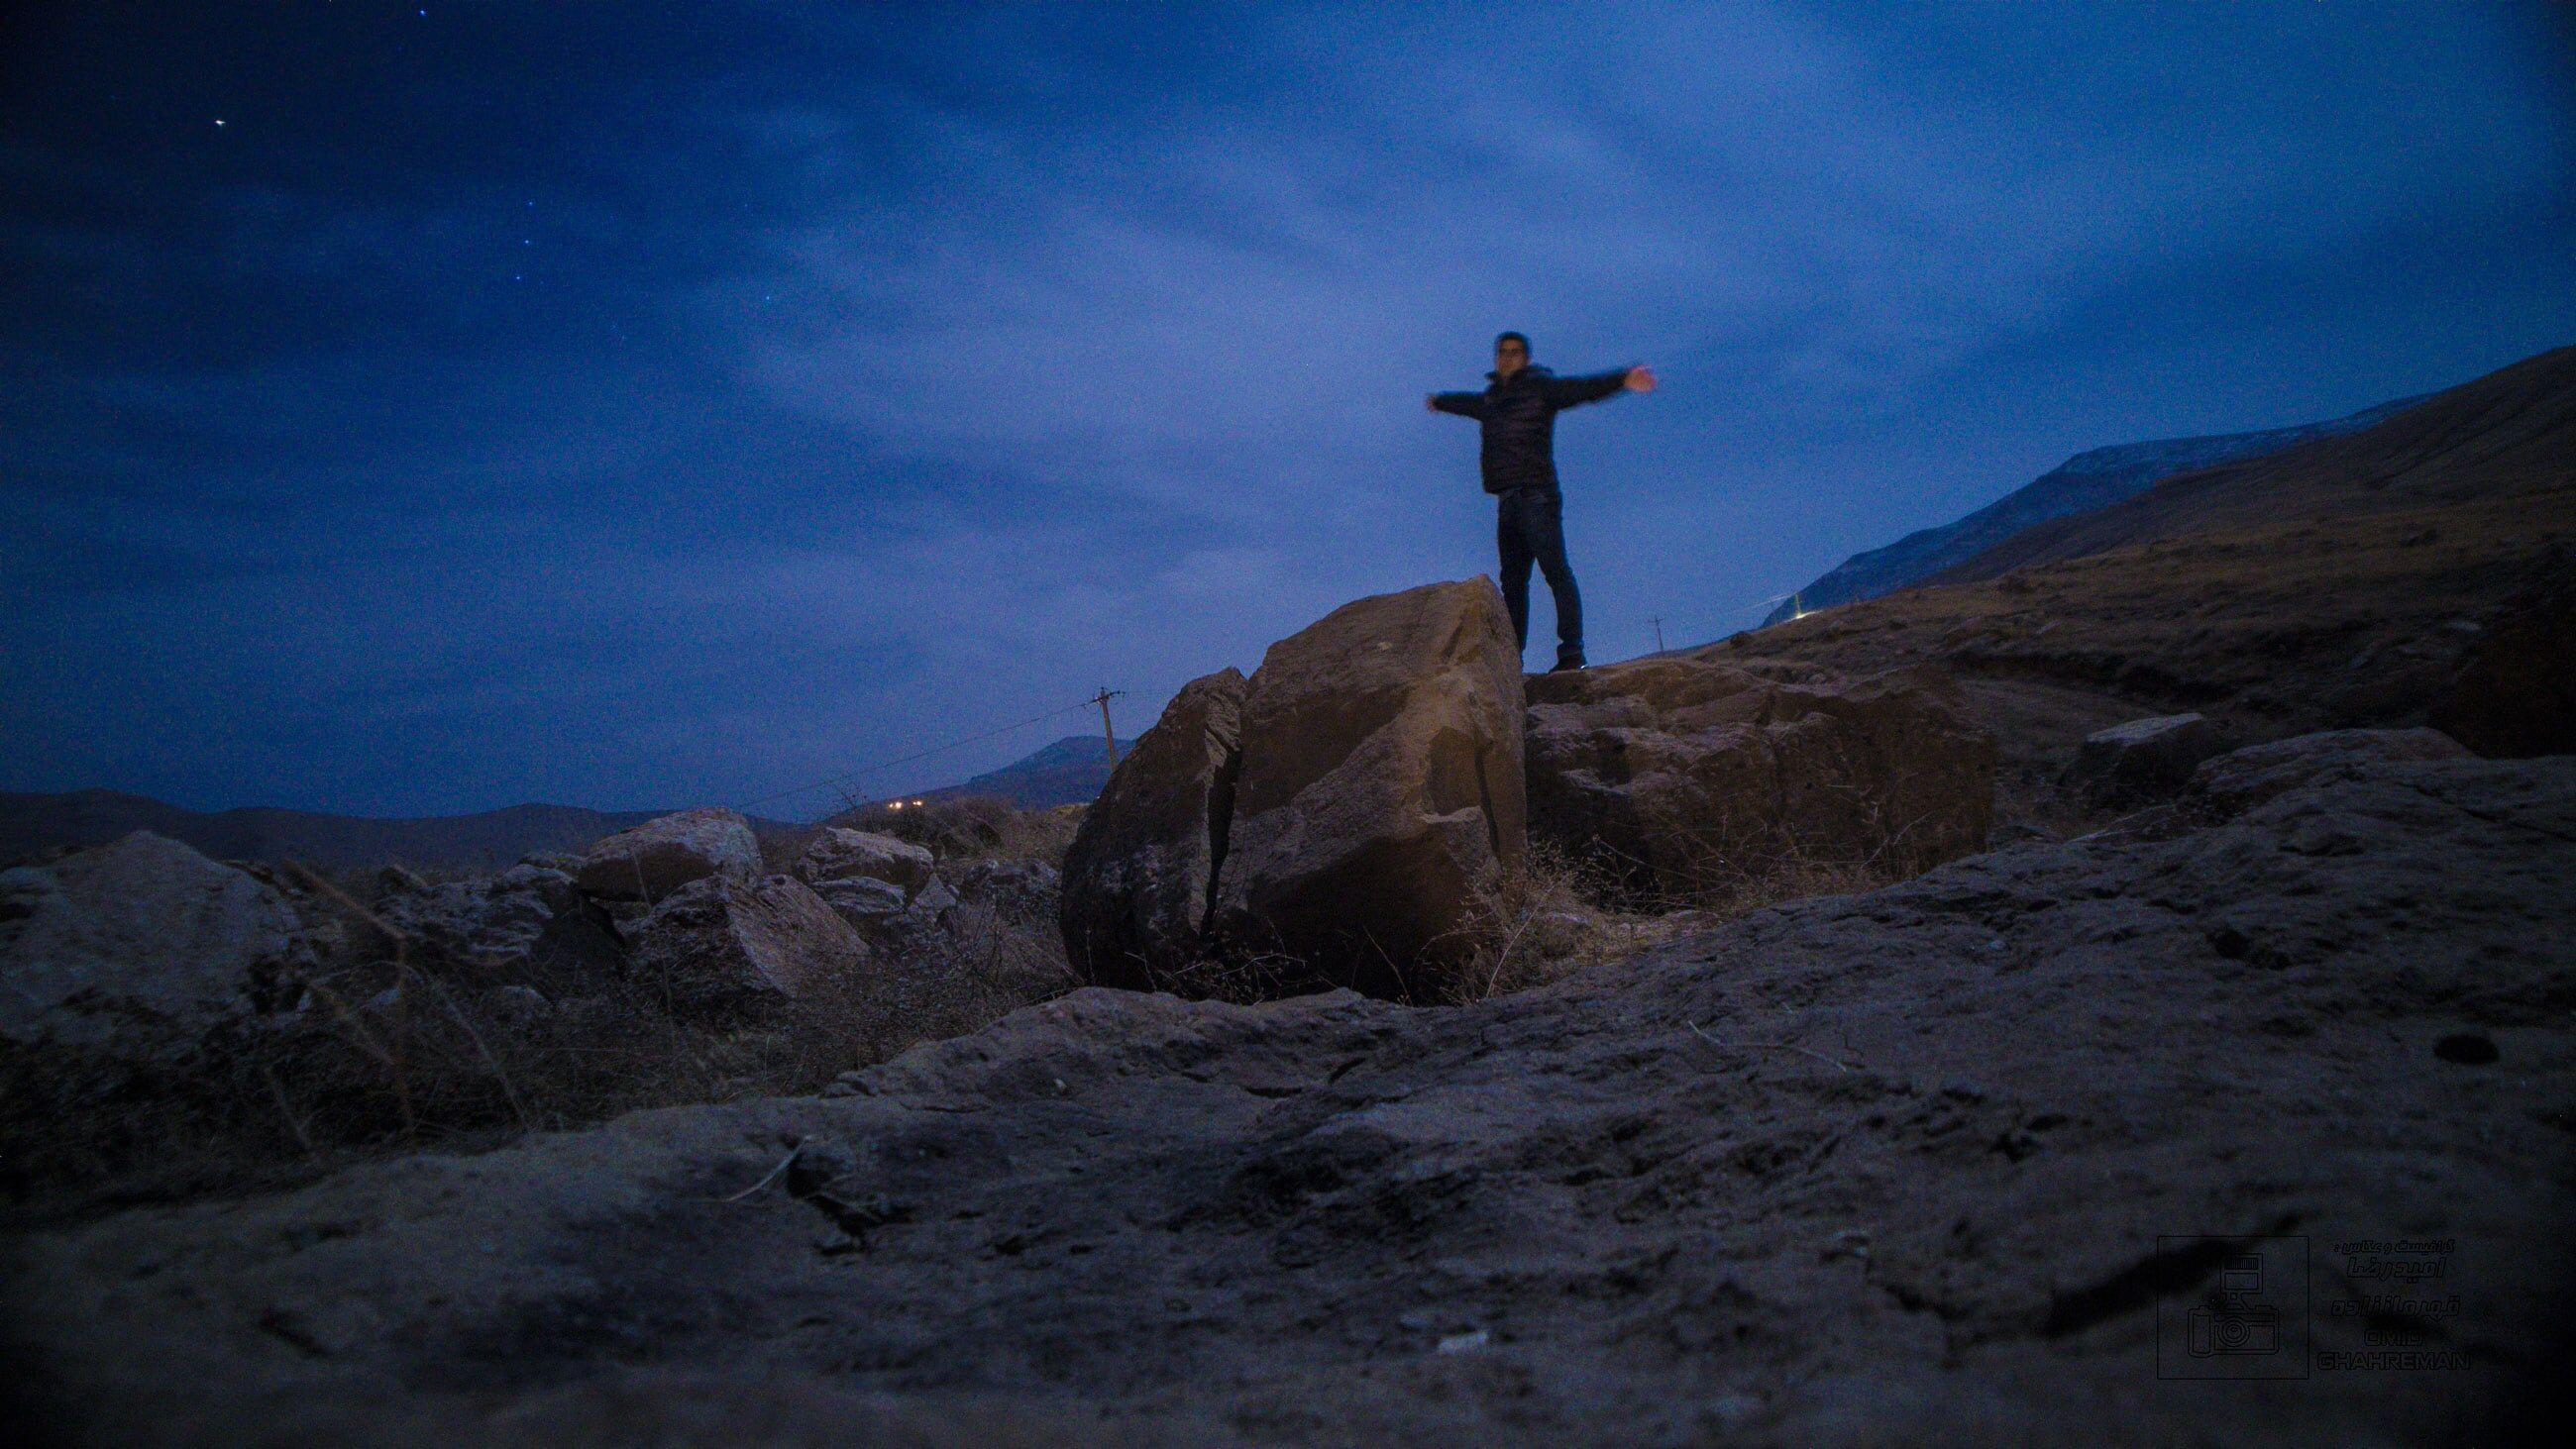 Iran QarahKhach در ارتفاعات قره خاچ ماکو امیدرضا قهرمانزاده